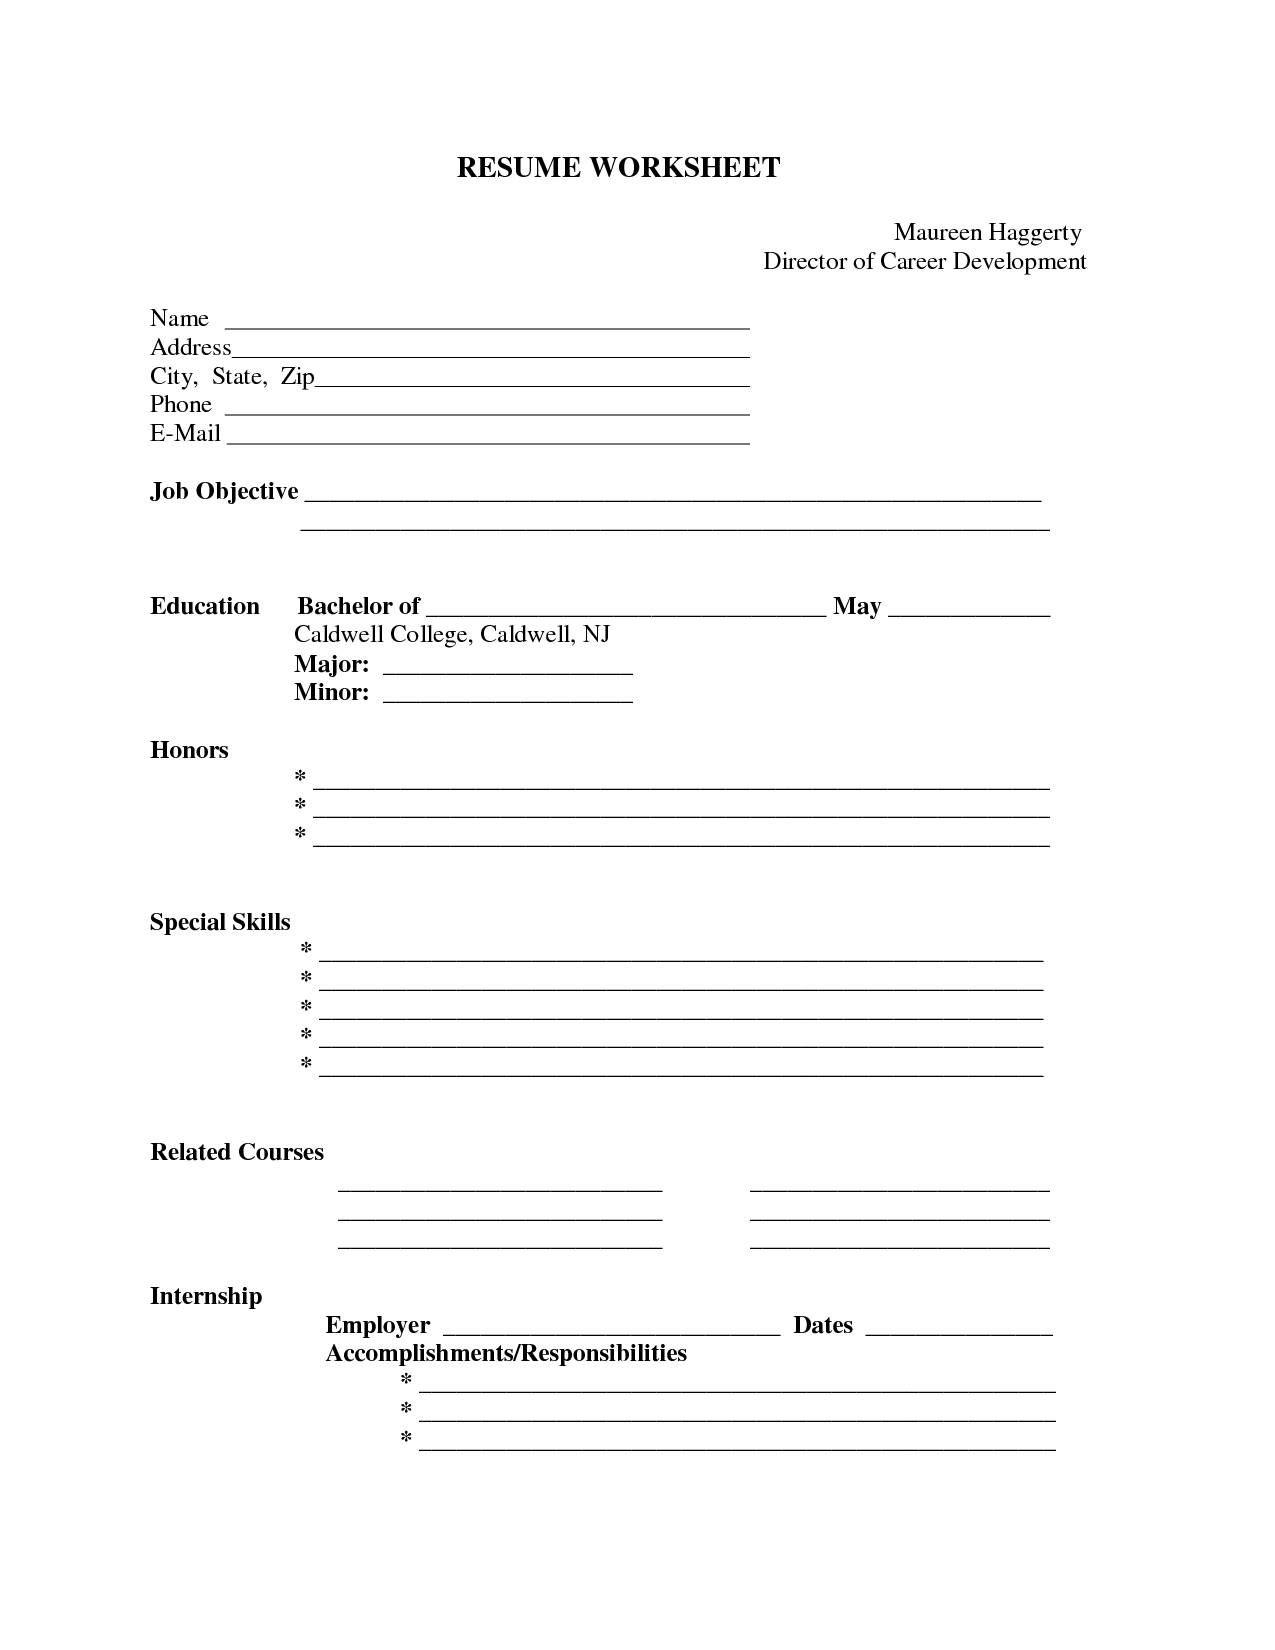 Pin Oleh Jobresume Di Resume Career Termplate Free   Resume Form - Free Printable Fill In The Blank Resume Templates